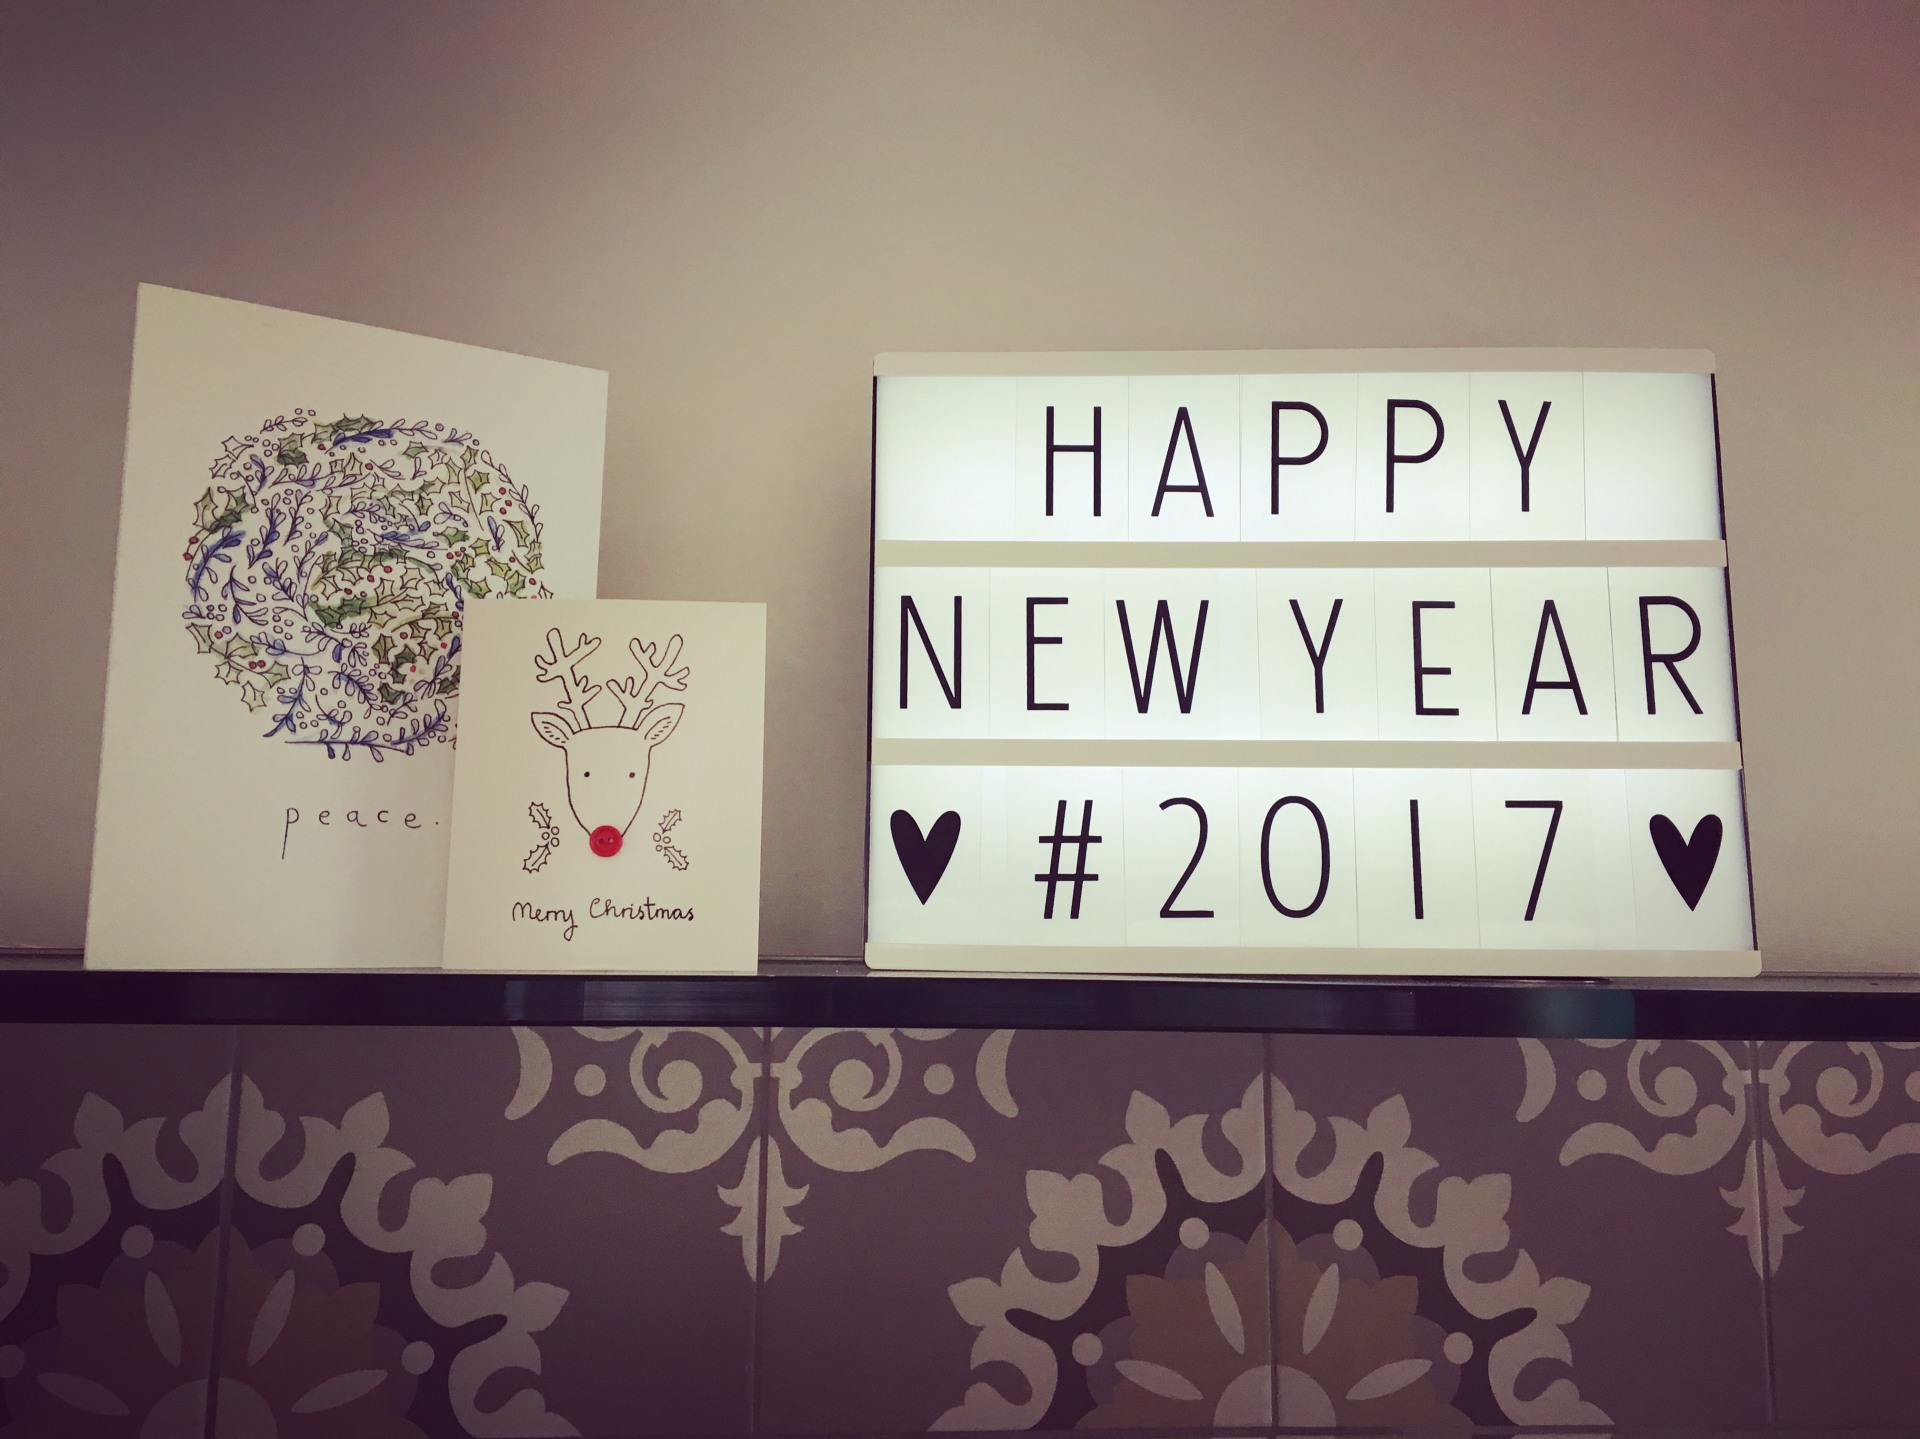 Happy New Year #2017